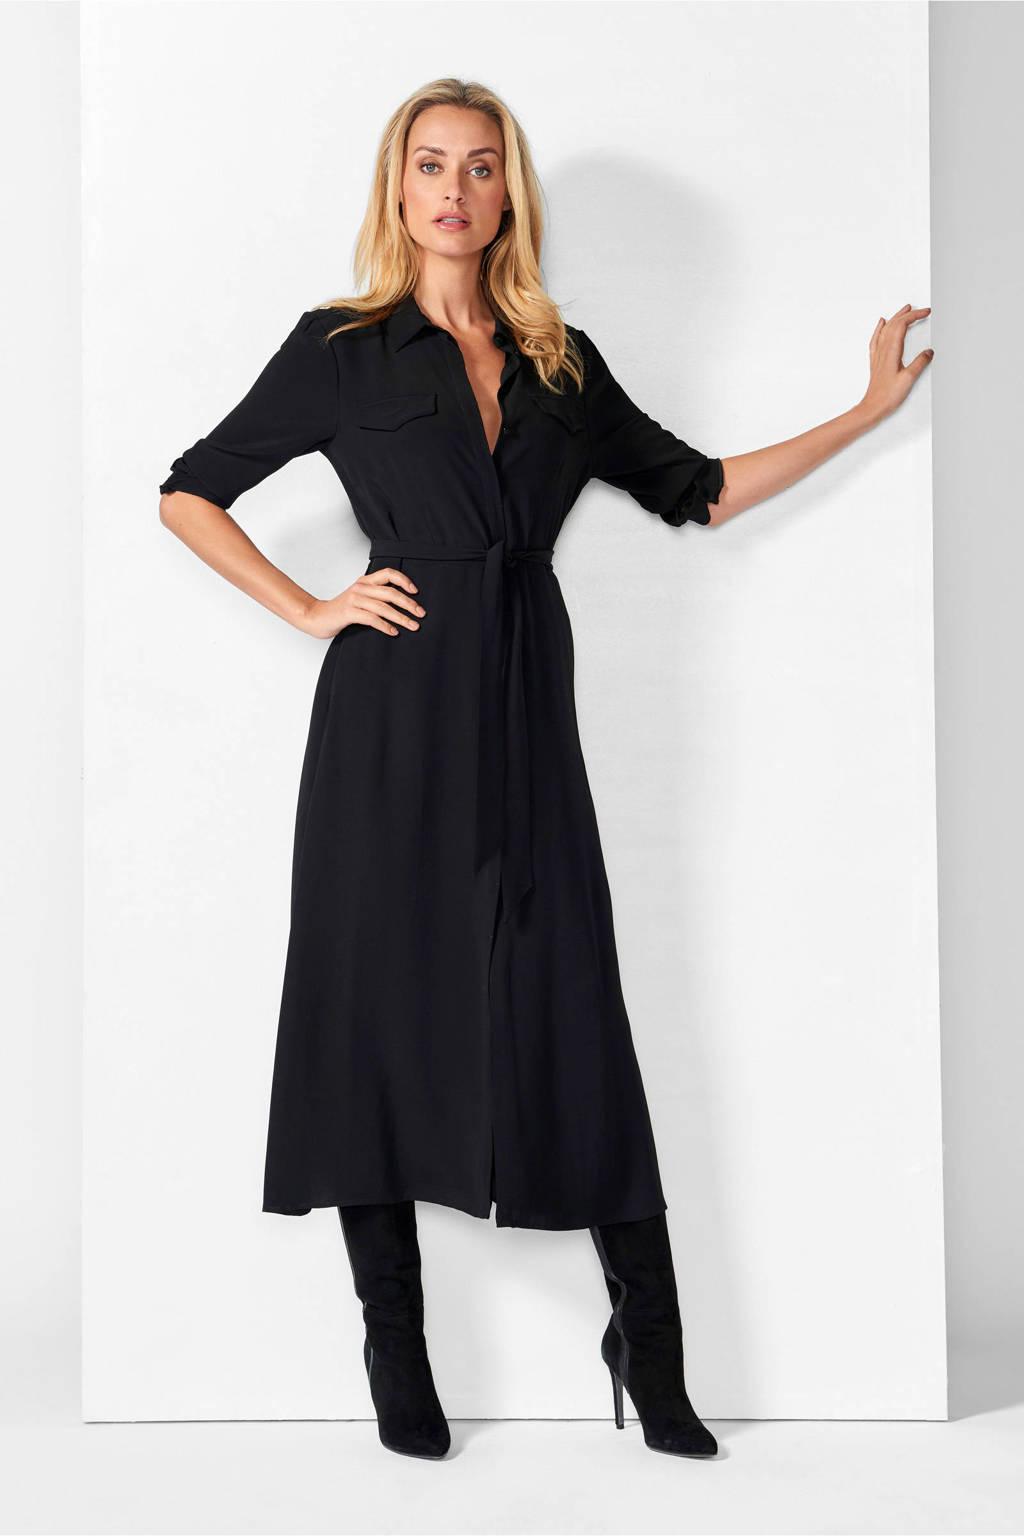 Mart Visser jurk zwart, Zwart